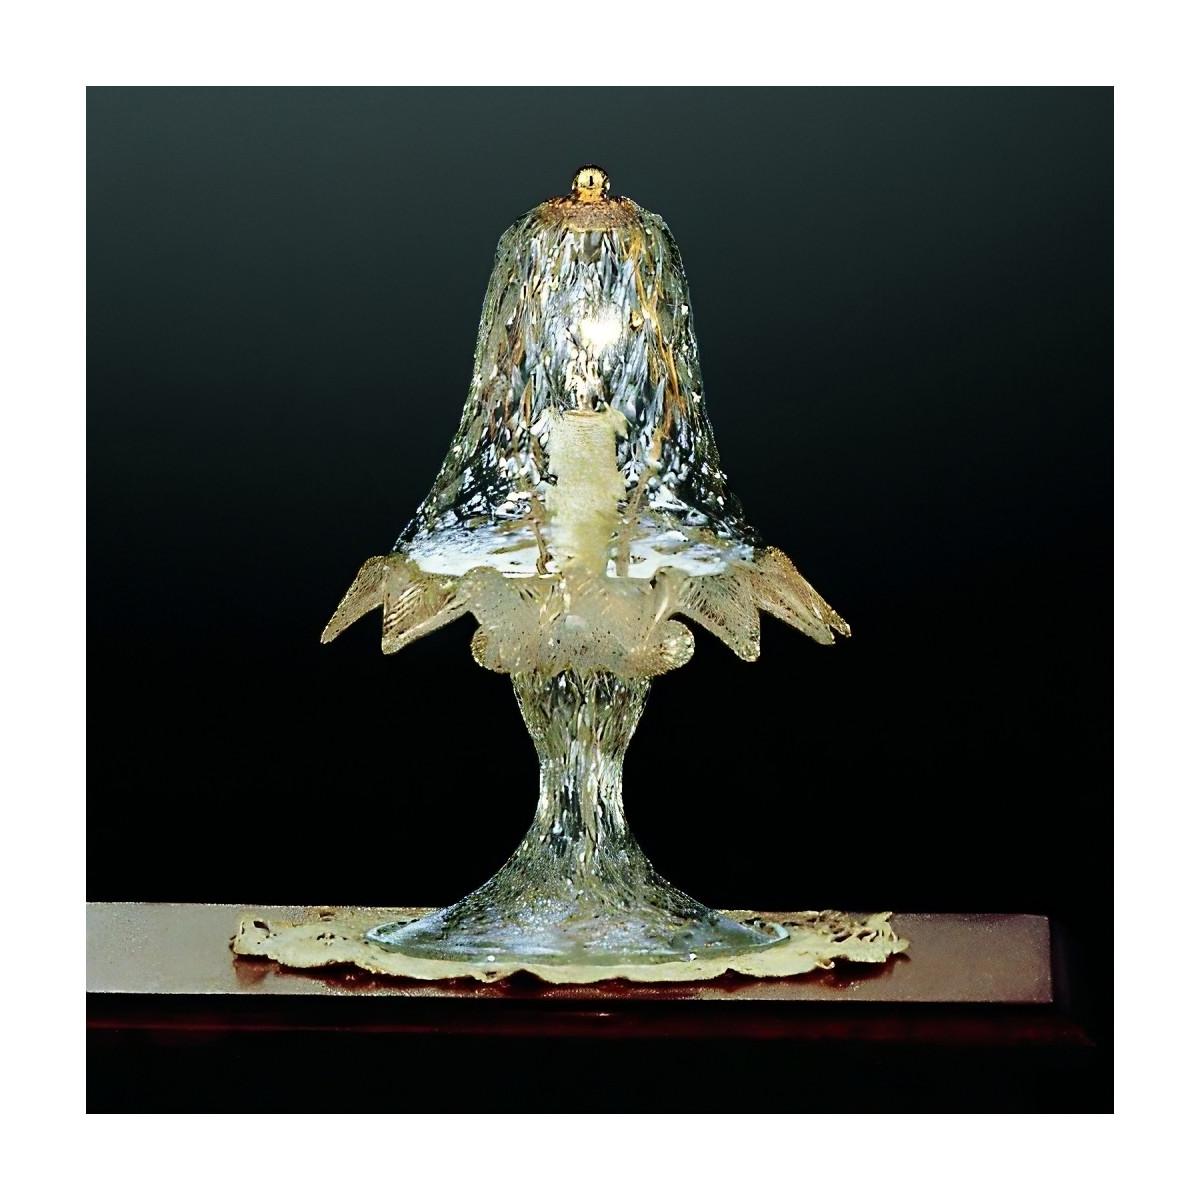 Casanova lampara de mesita de noche de Murano - color transparente oro